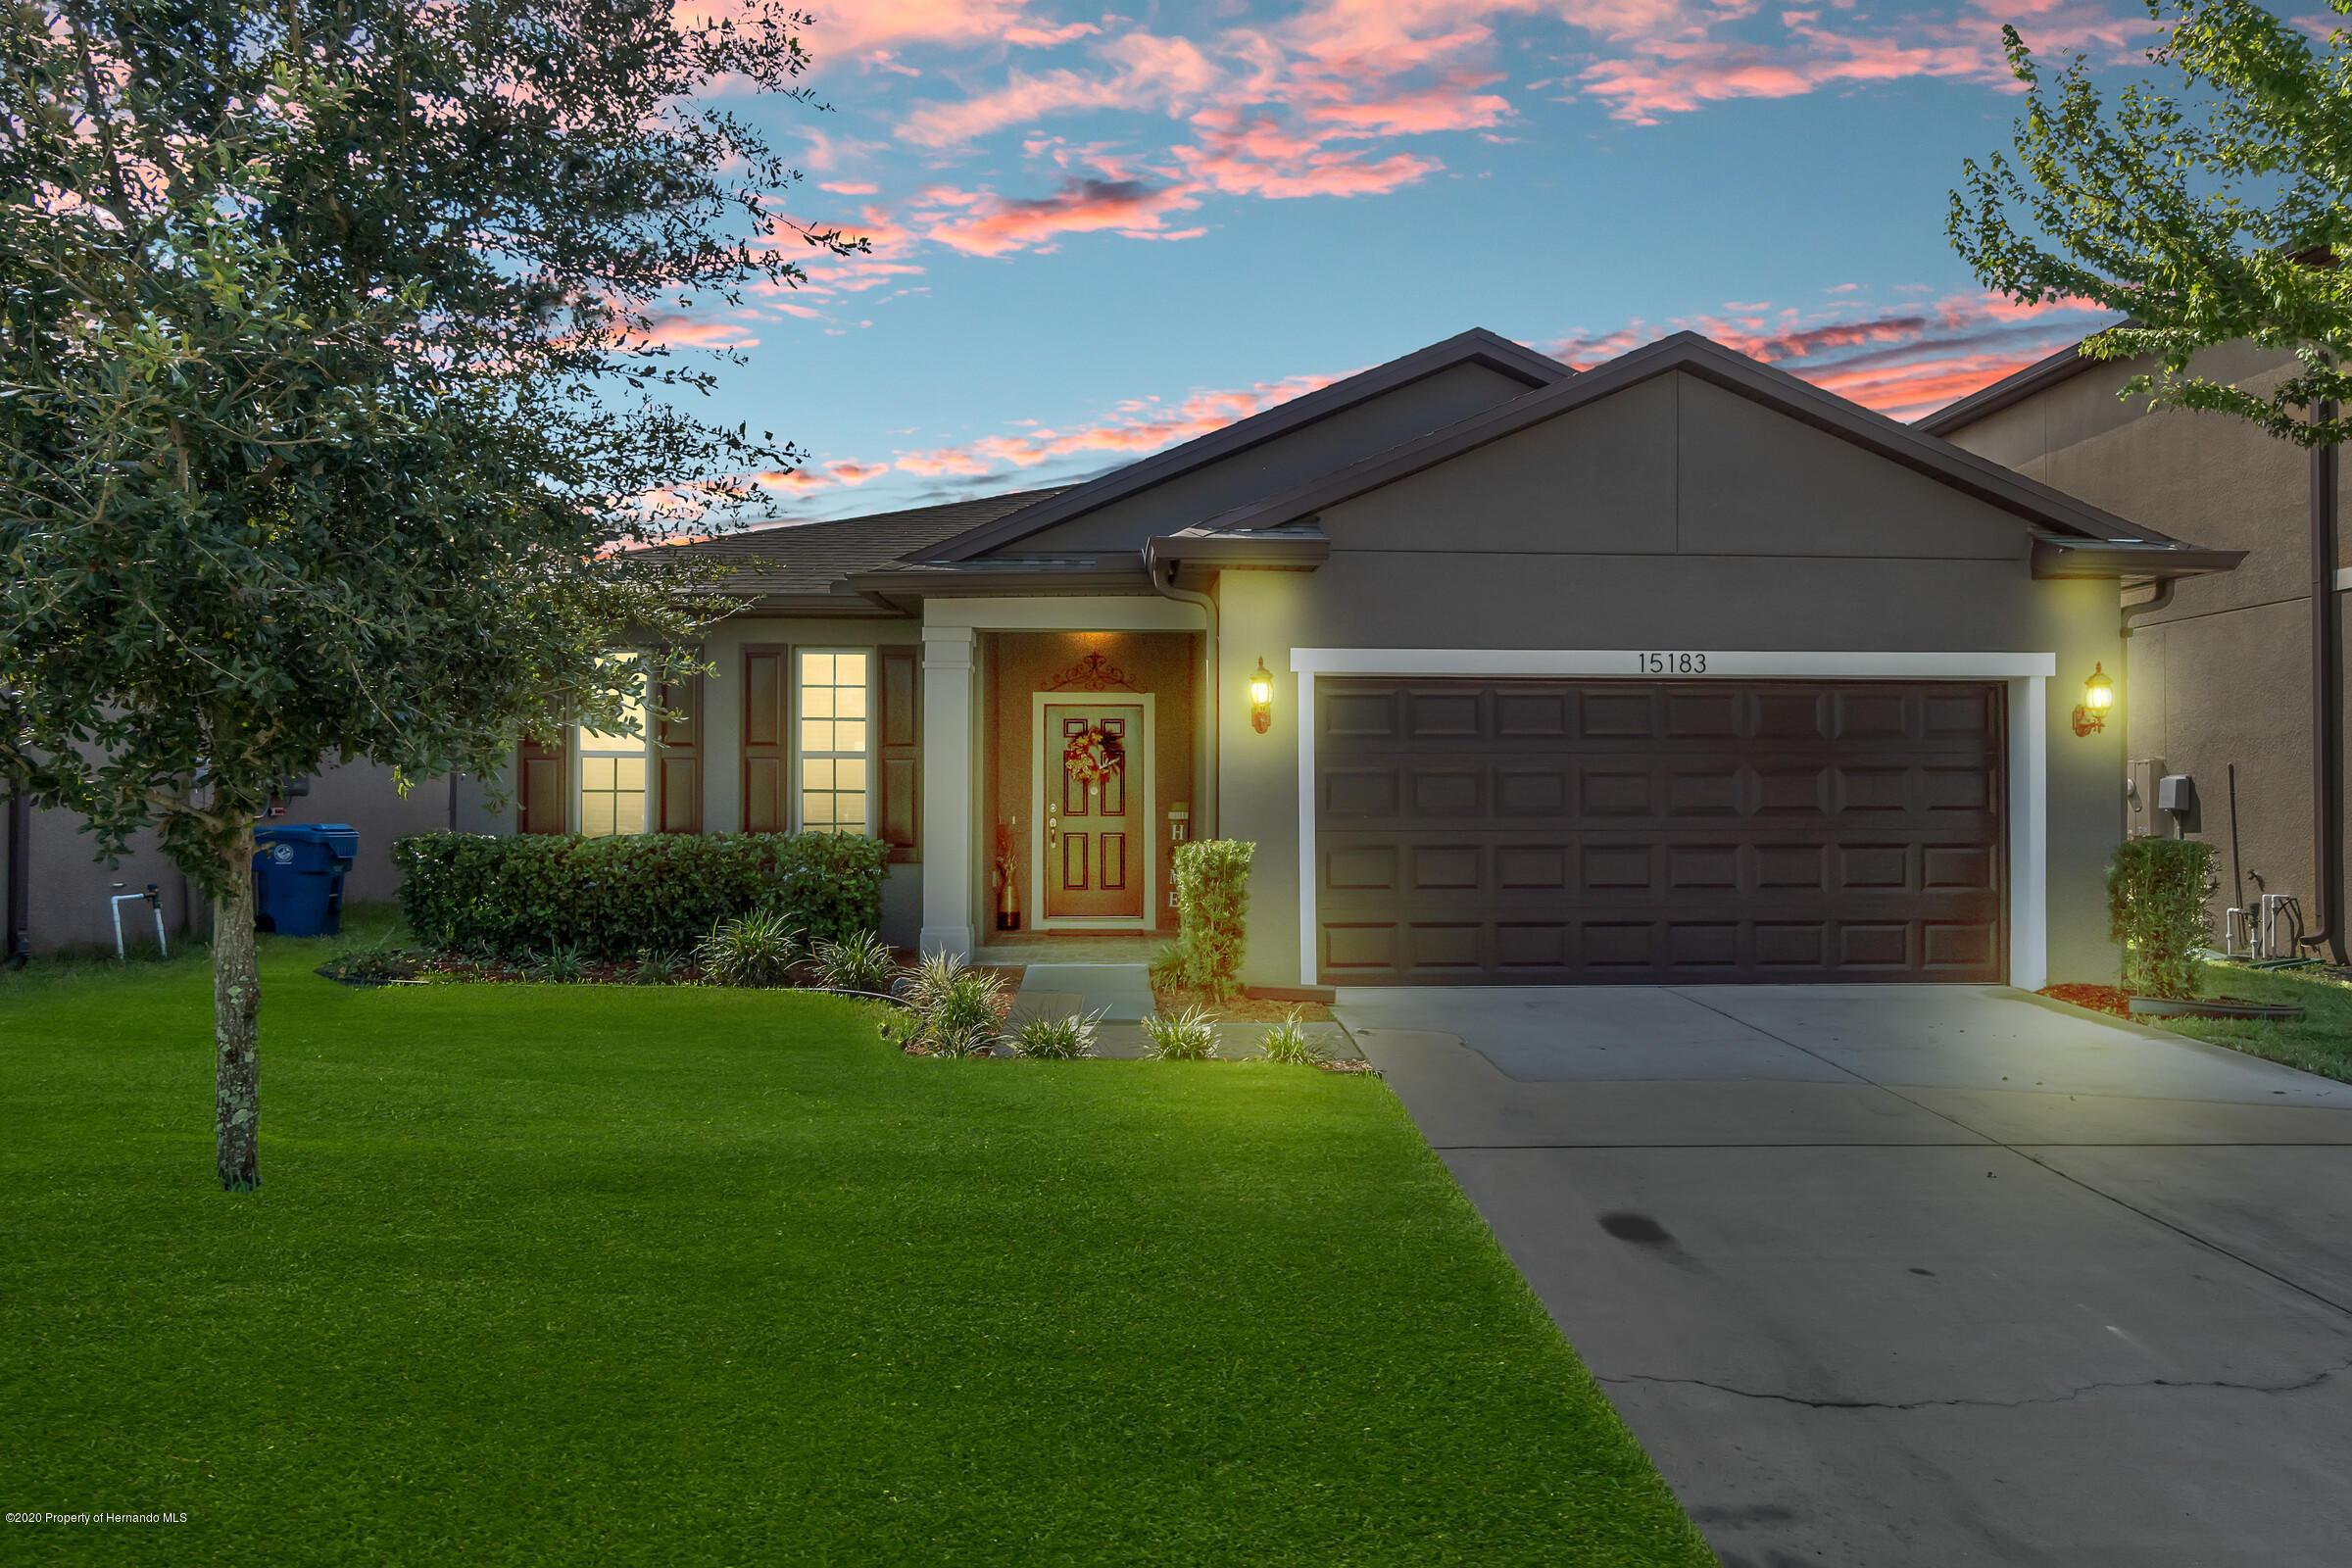 15183 Stone House Drive